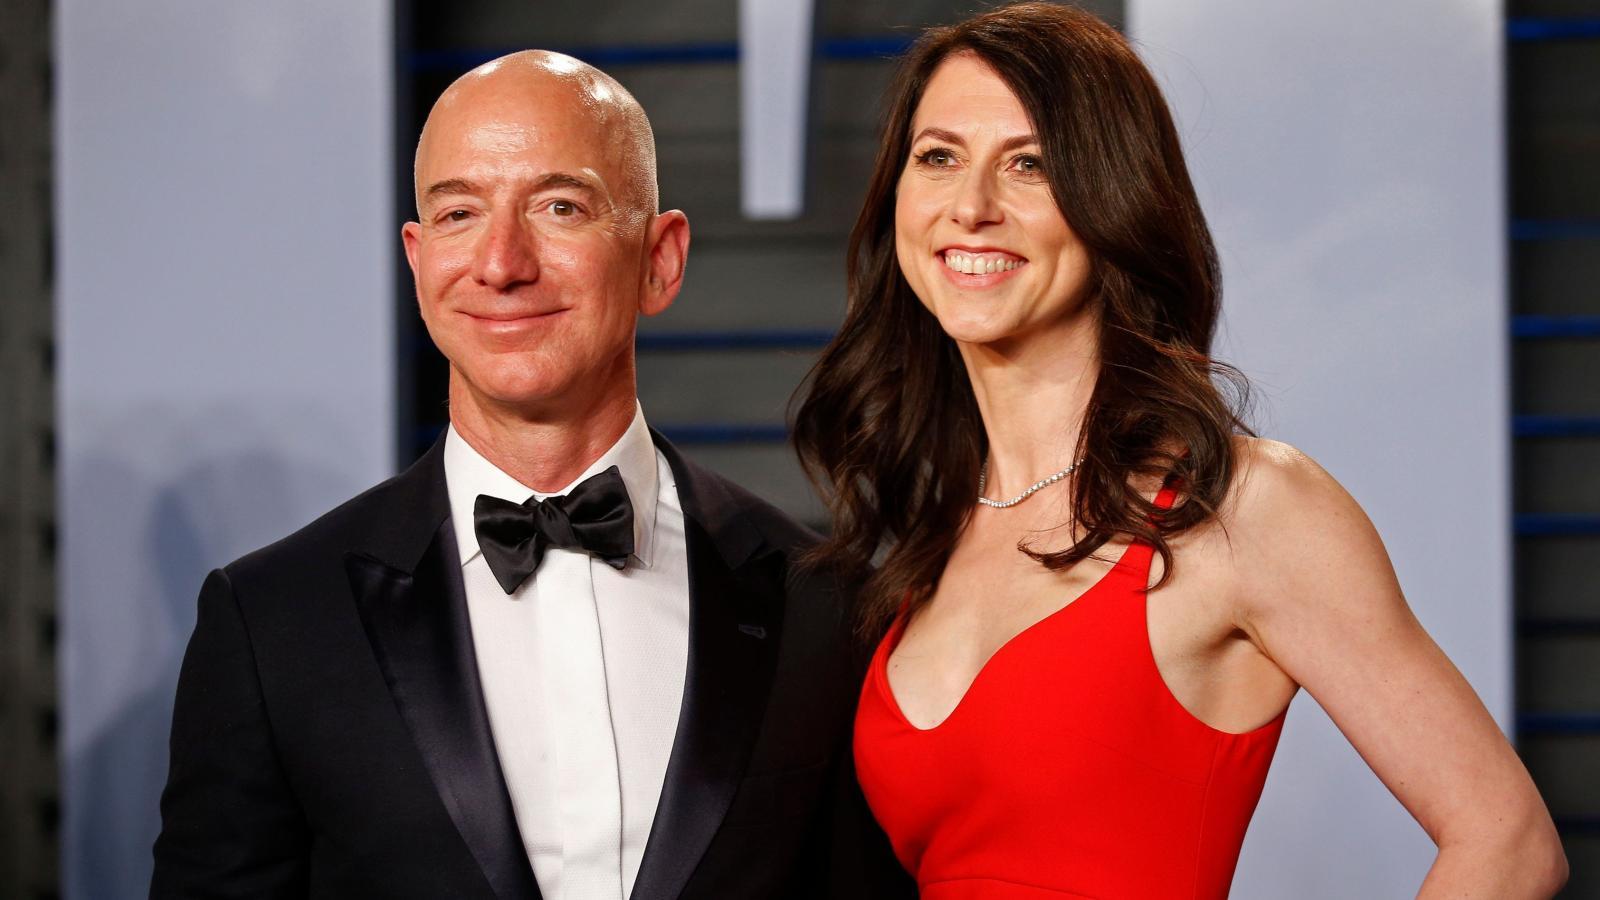 Jeff Bezos and his wife MacKenzie